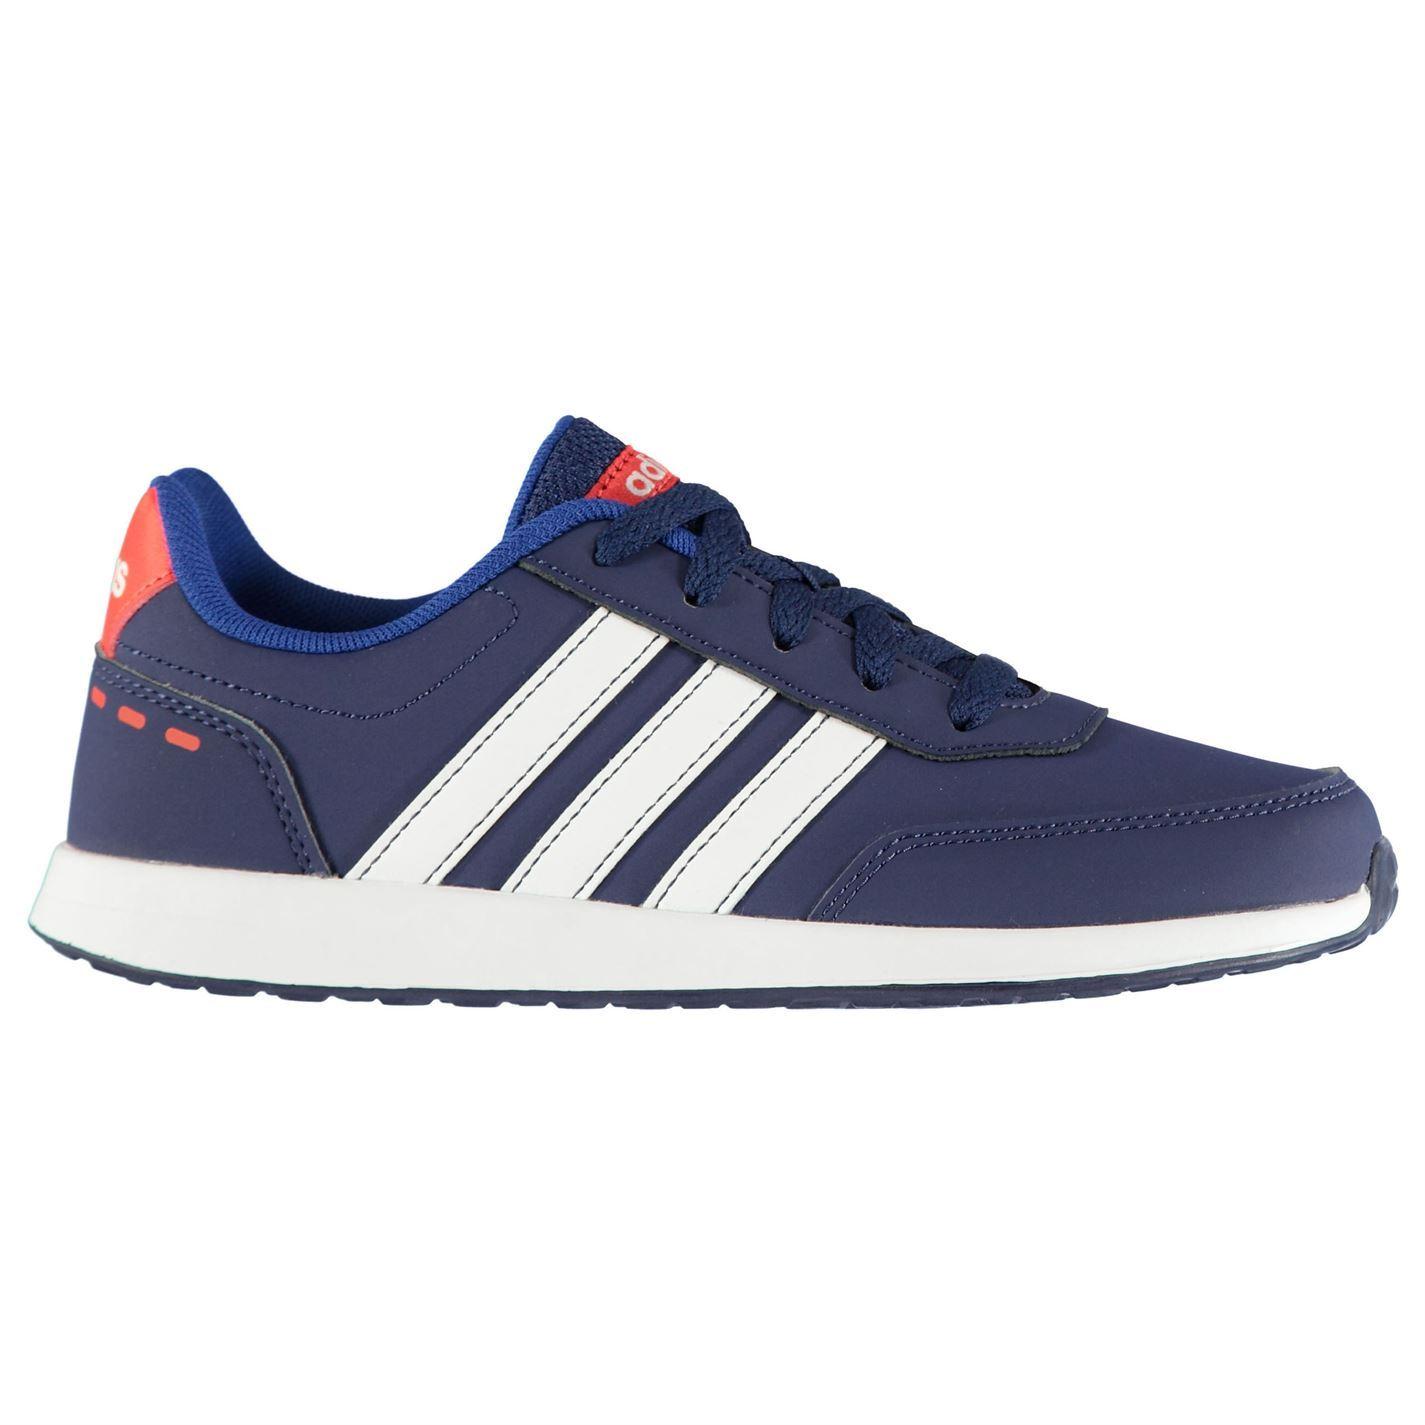 miniatura 6 - ADIDAS-Switch-Nubuck-Scarpe-da-ginnastica-bambino-ragazzo-calzature